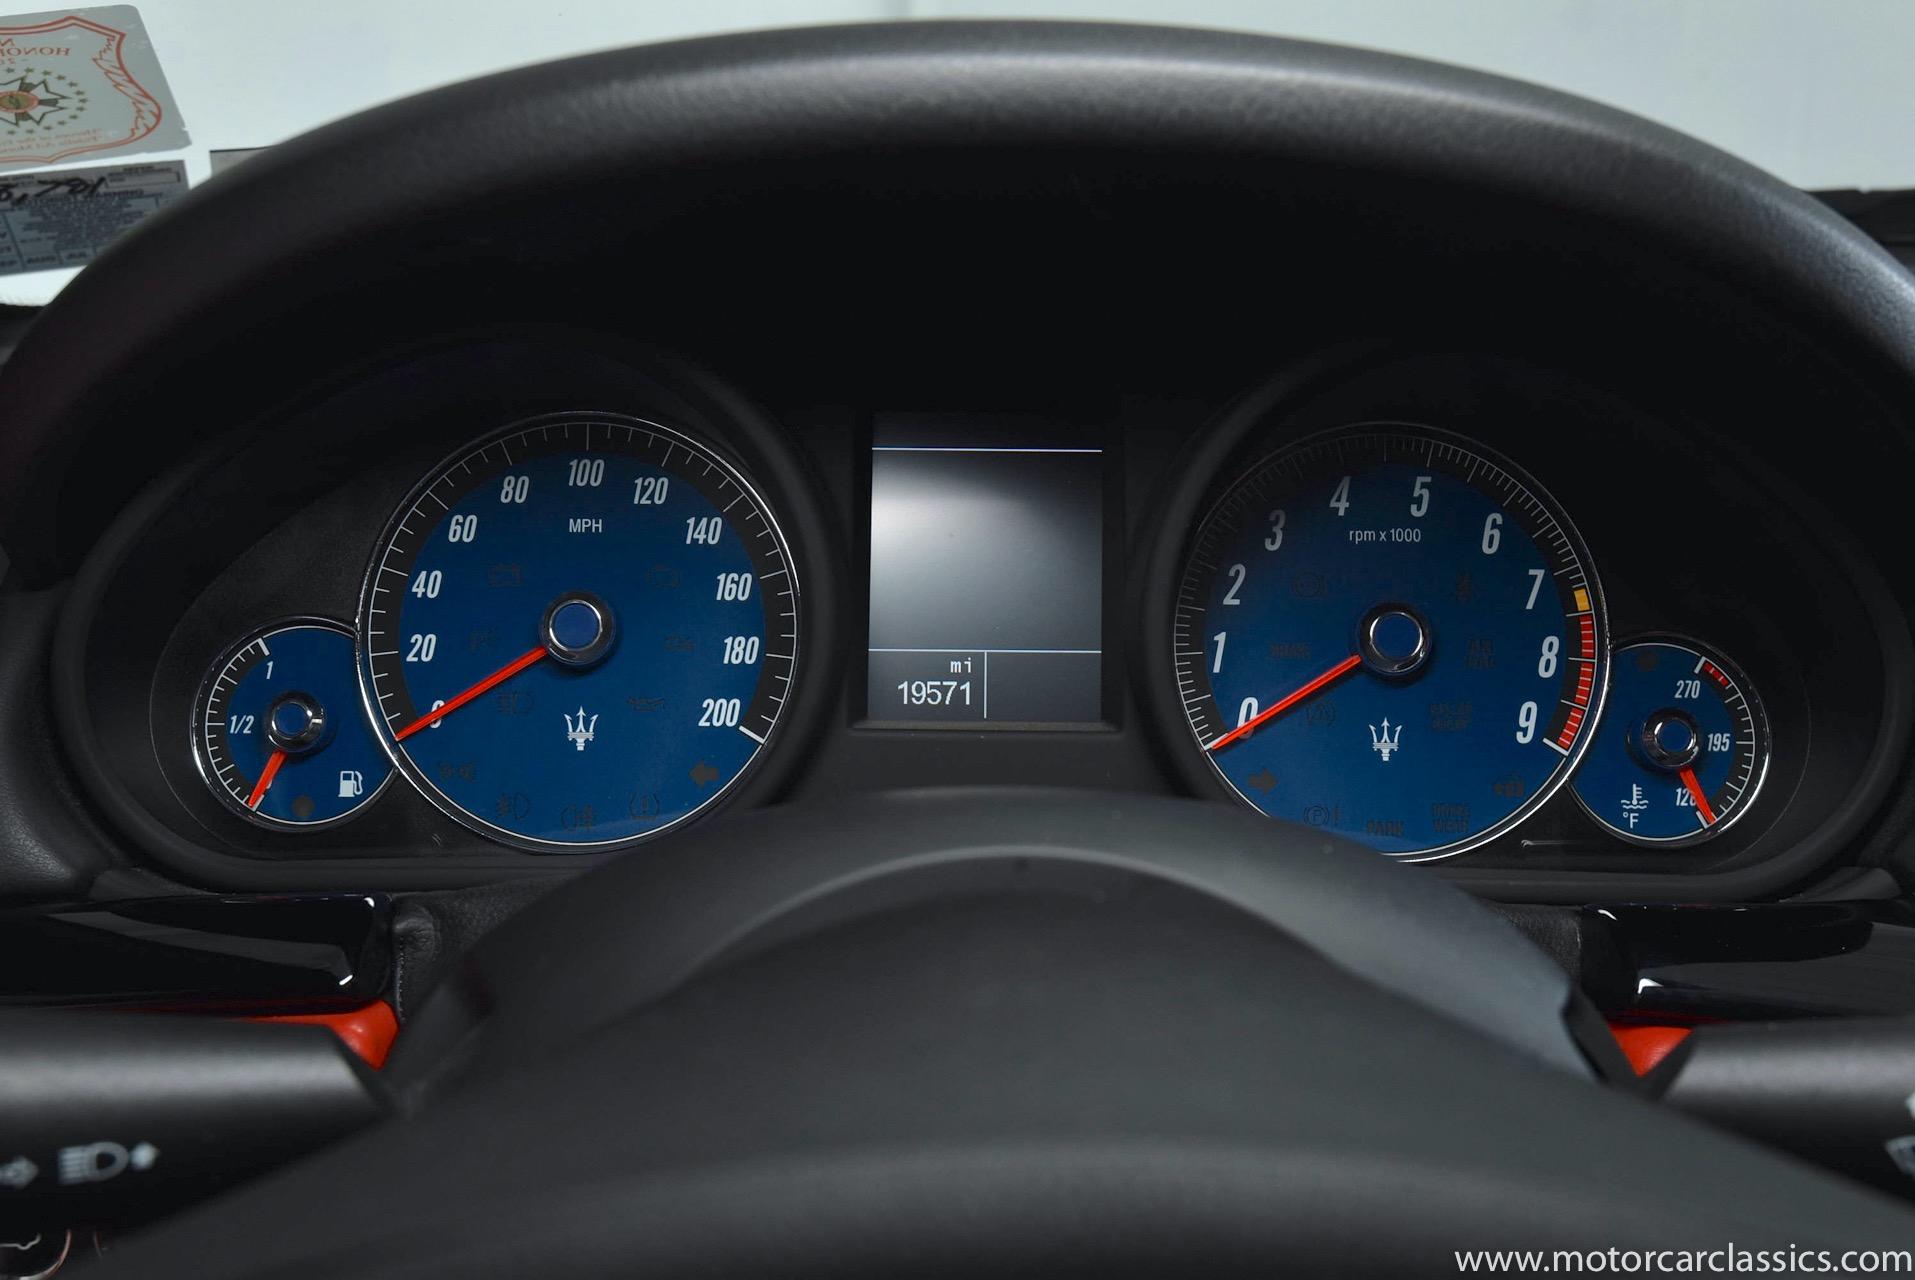 2011 Maserati GranTurismo S MC Sportline